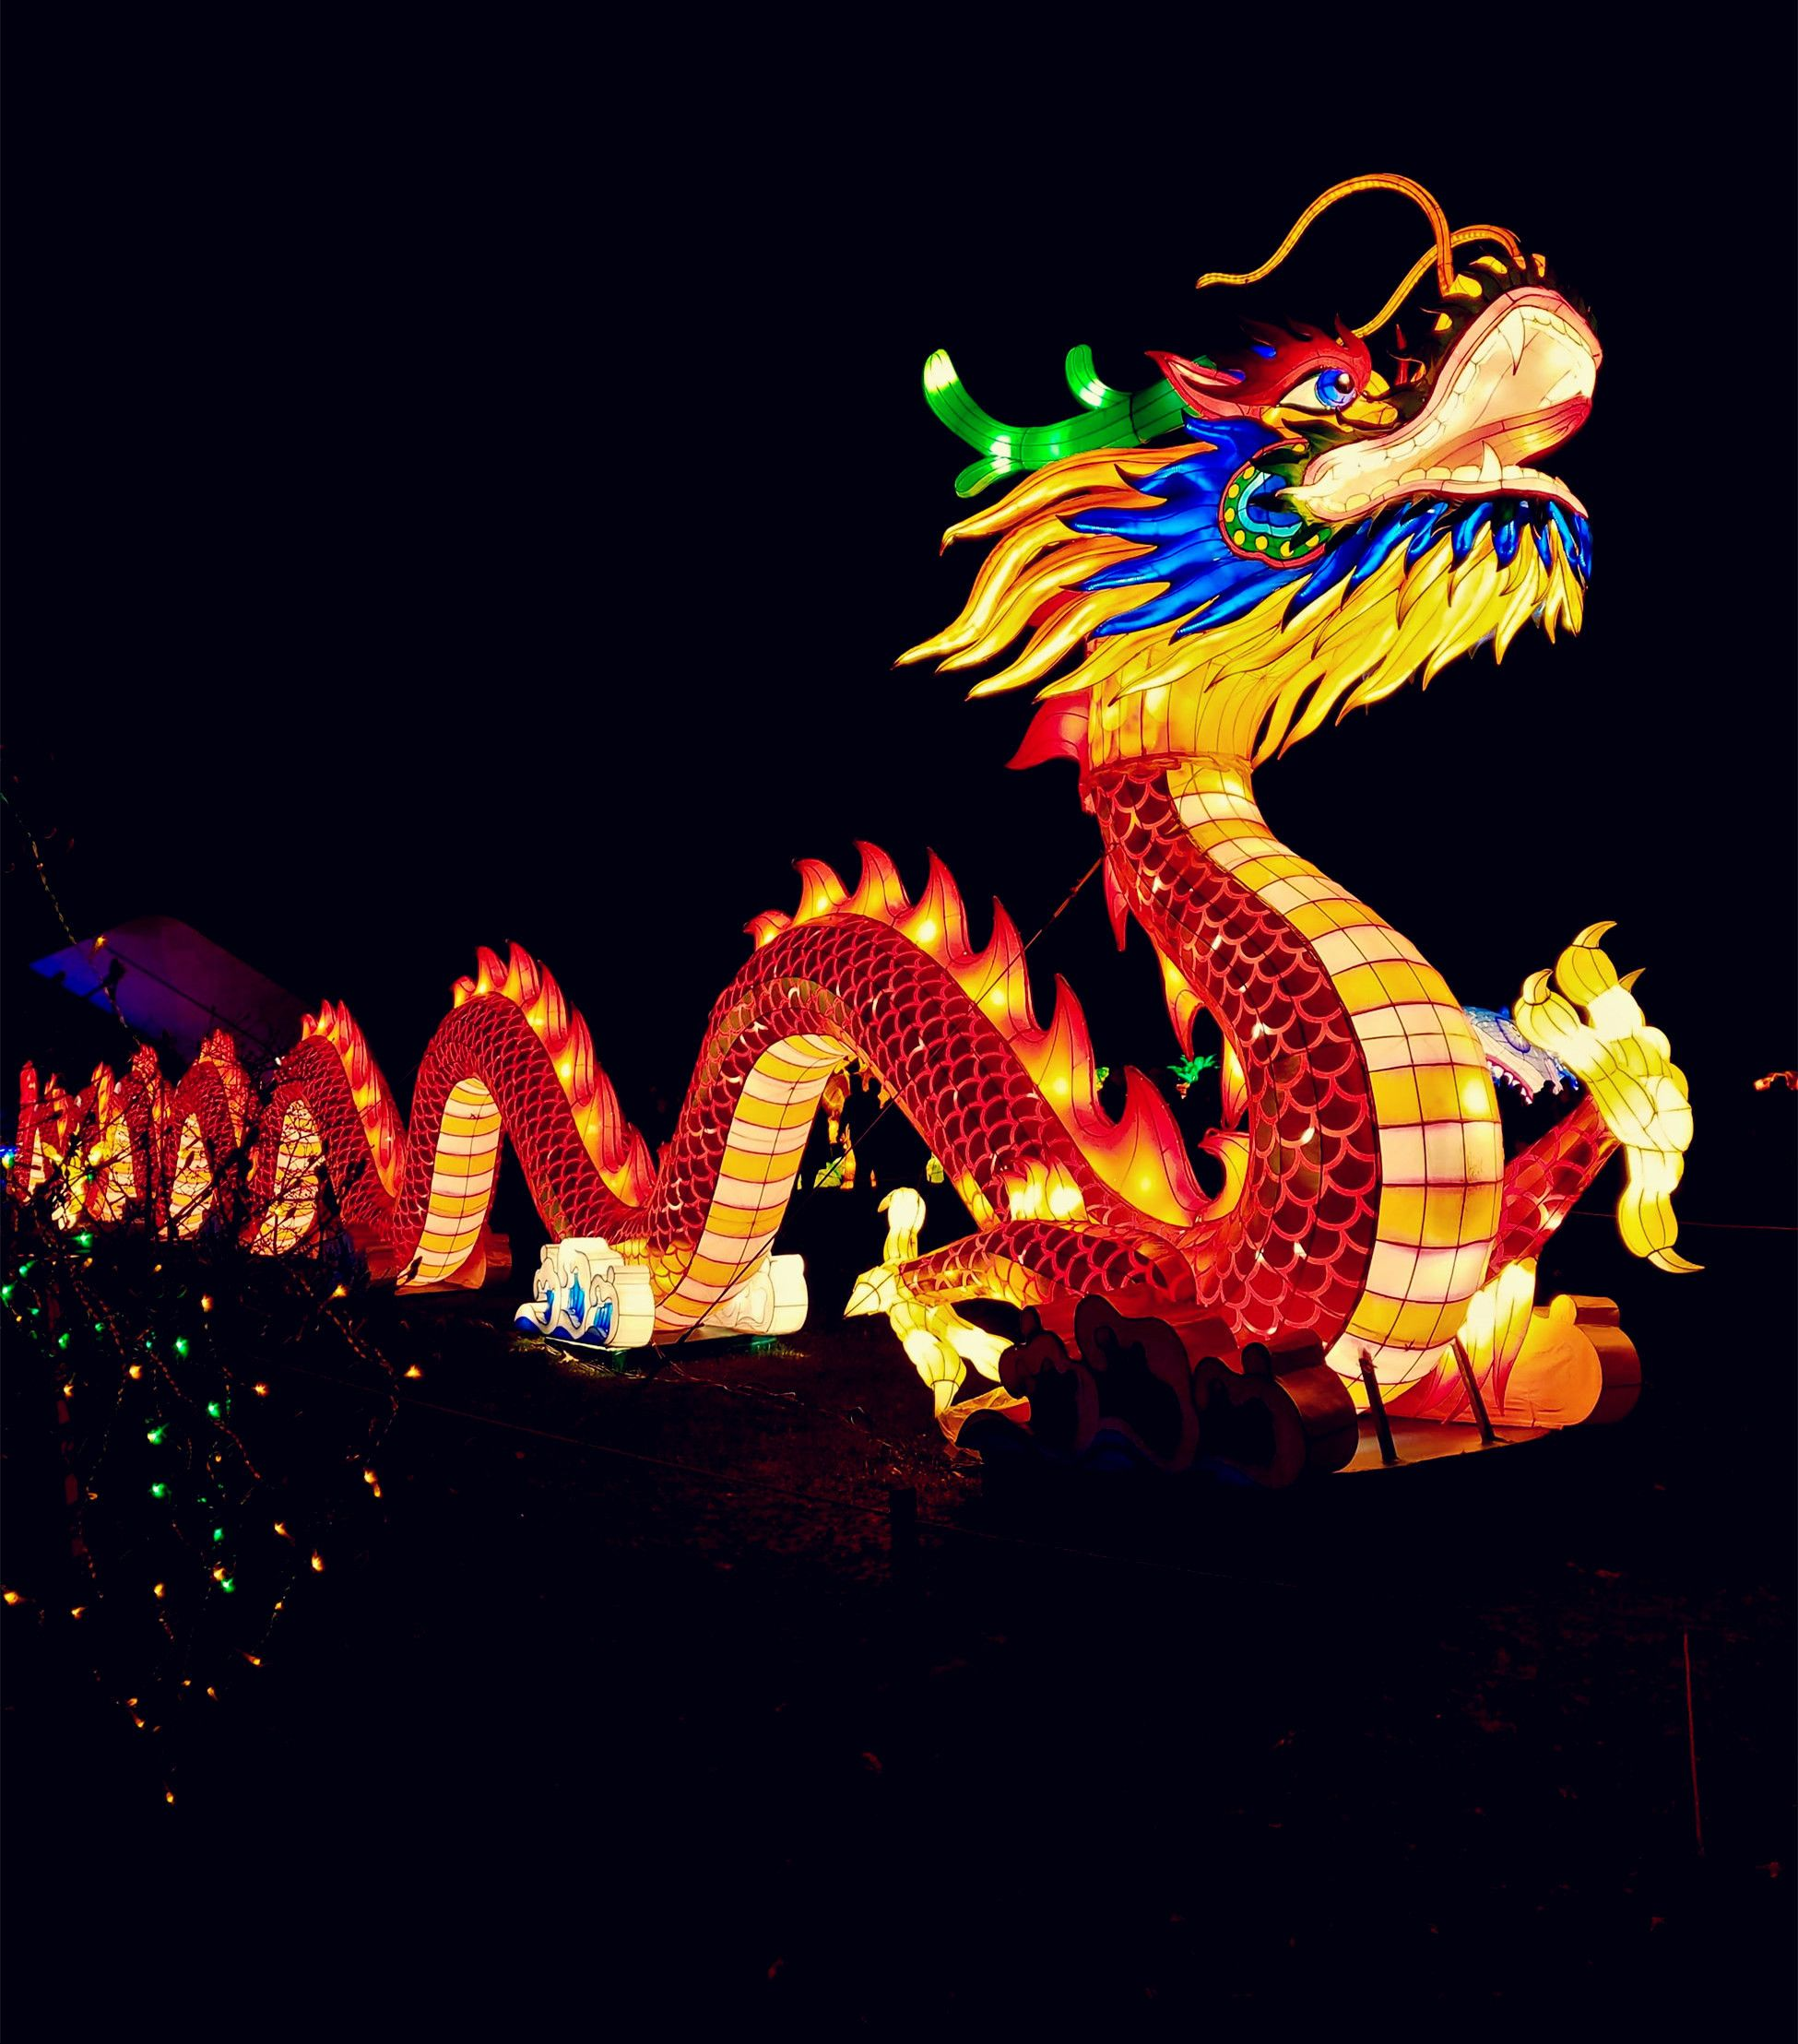 chinese new year dragon dance cchatty chinese new year dragon dance cchatty